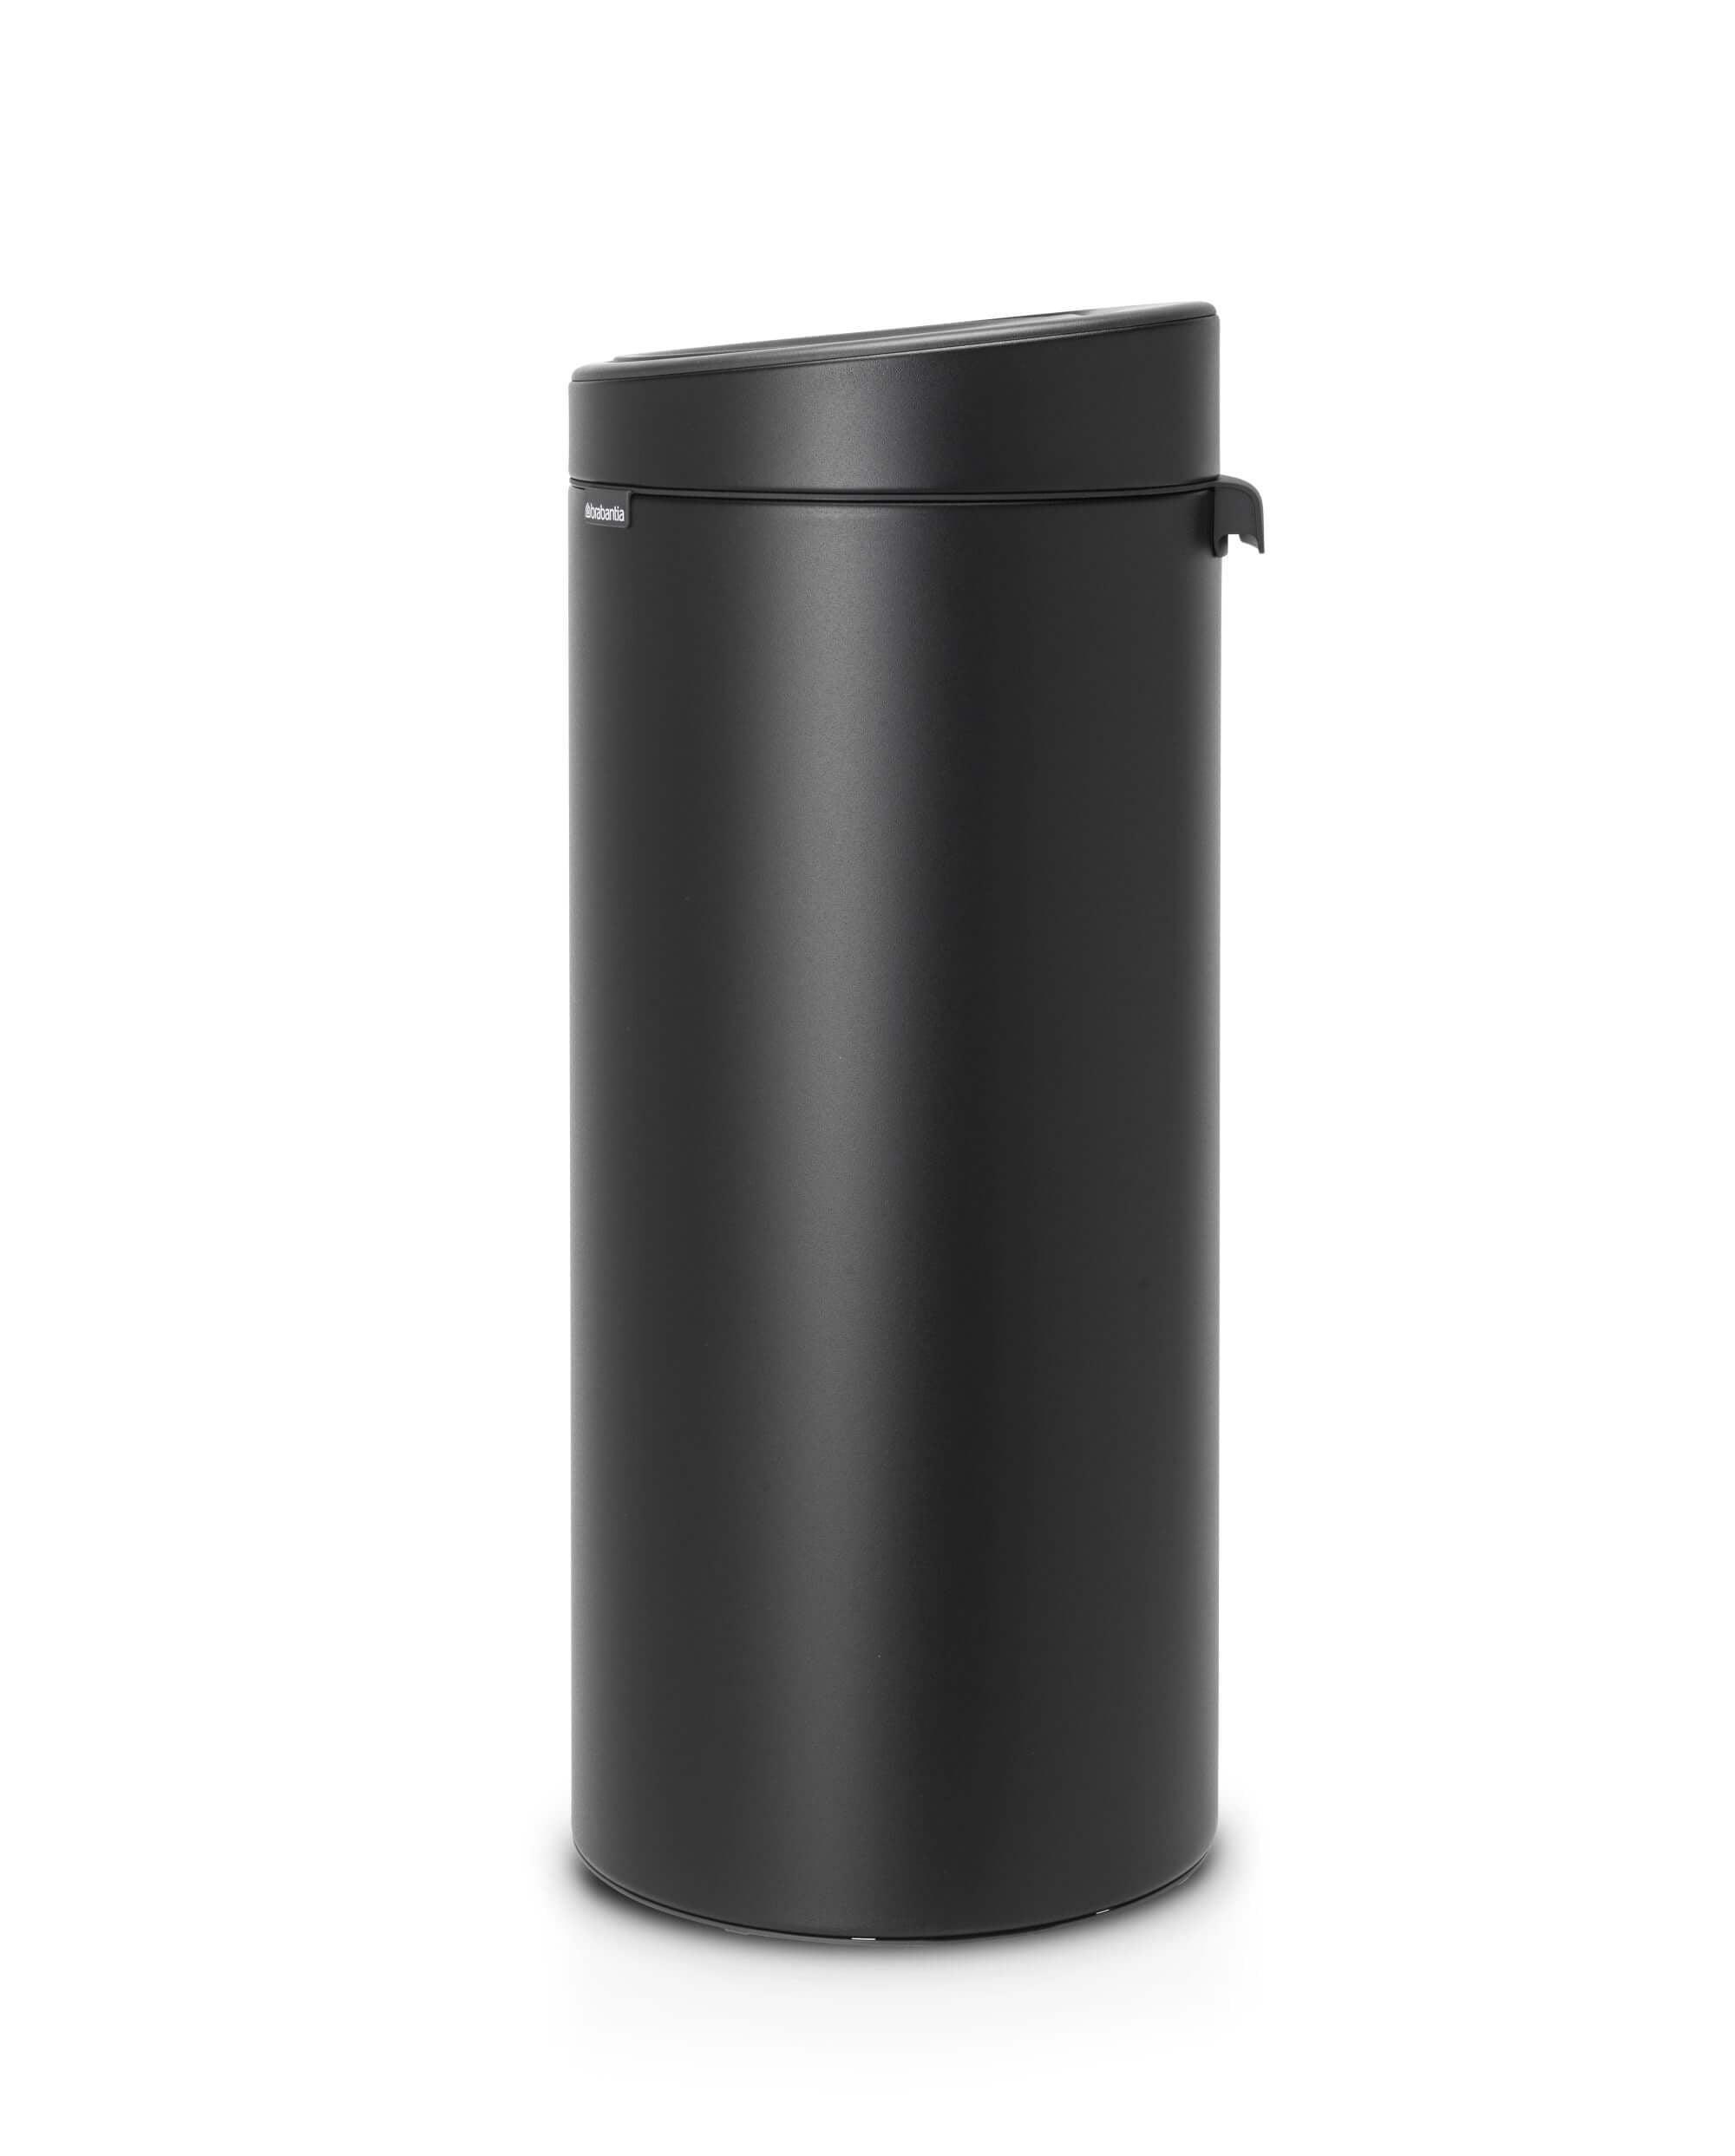 Brabantia Touch Bin Zwart 30 Liter.Brabantia Touch Bin 30 Liter Mineral Moonlight Black Brabantia Touch Bin 30 Liter Mineral Moonlight Black